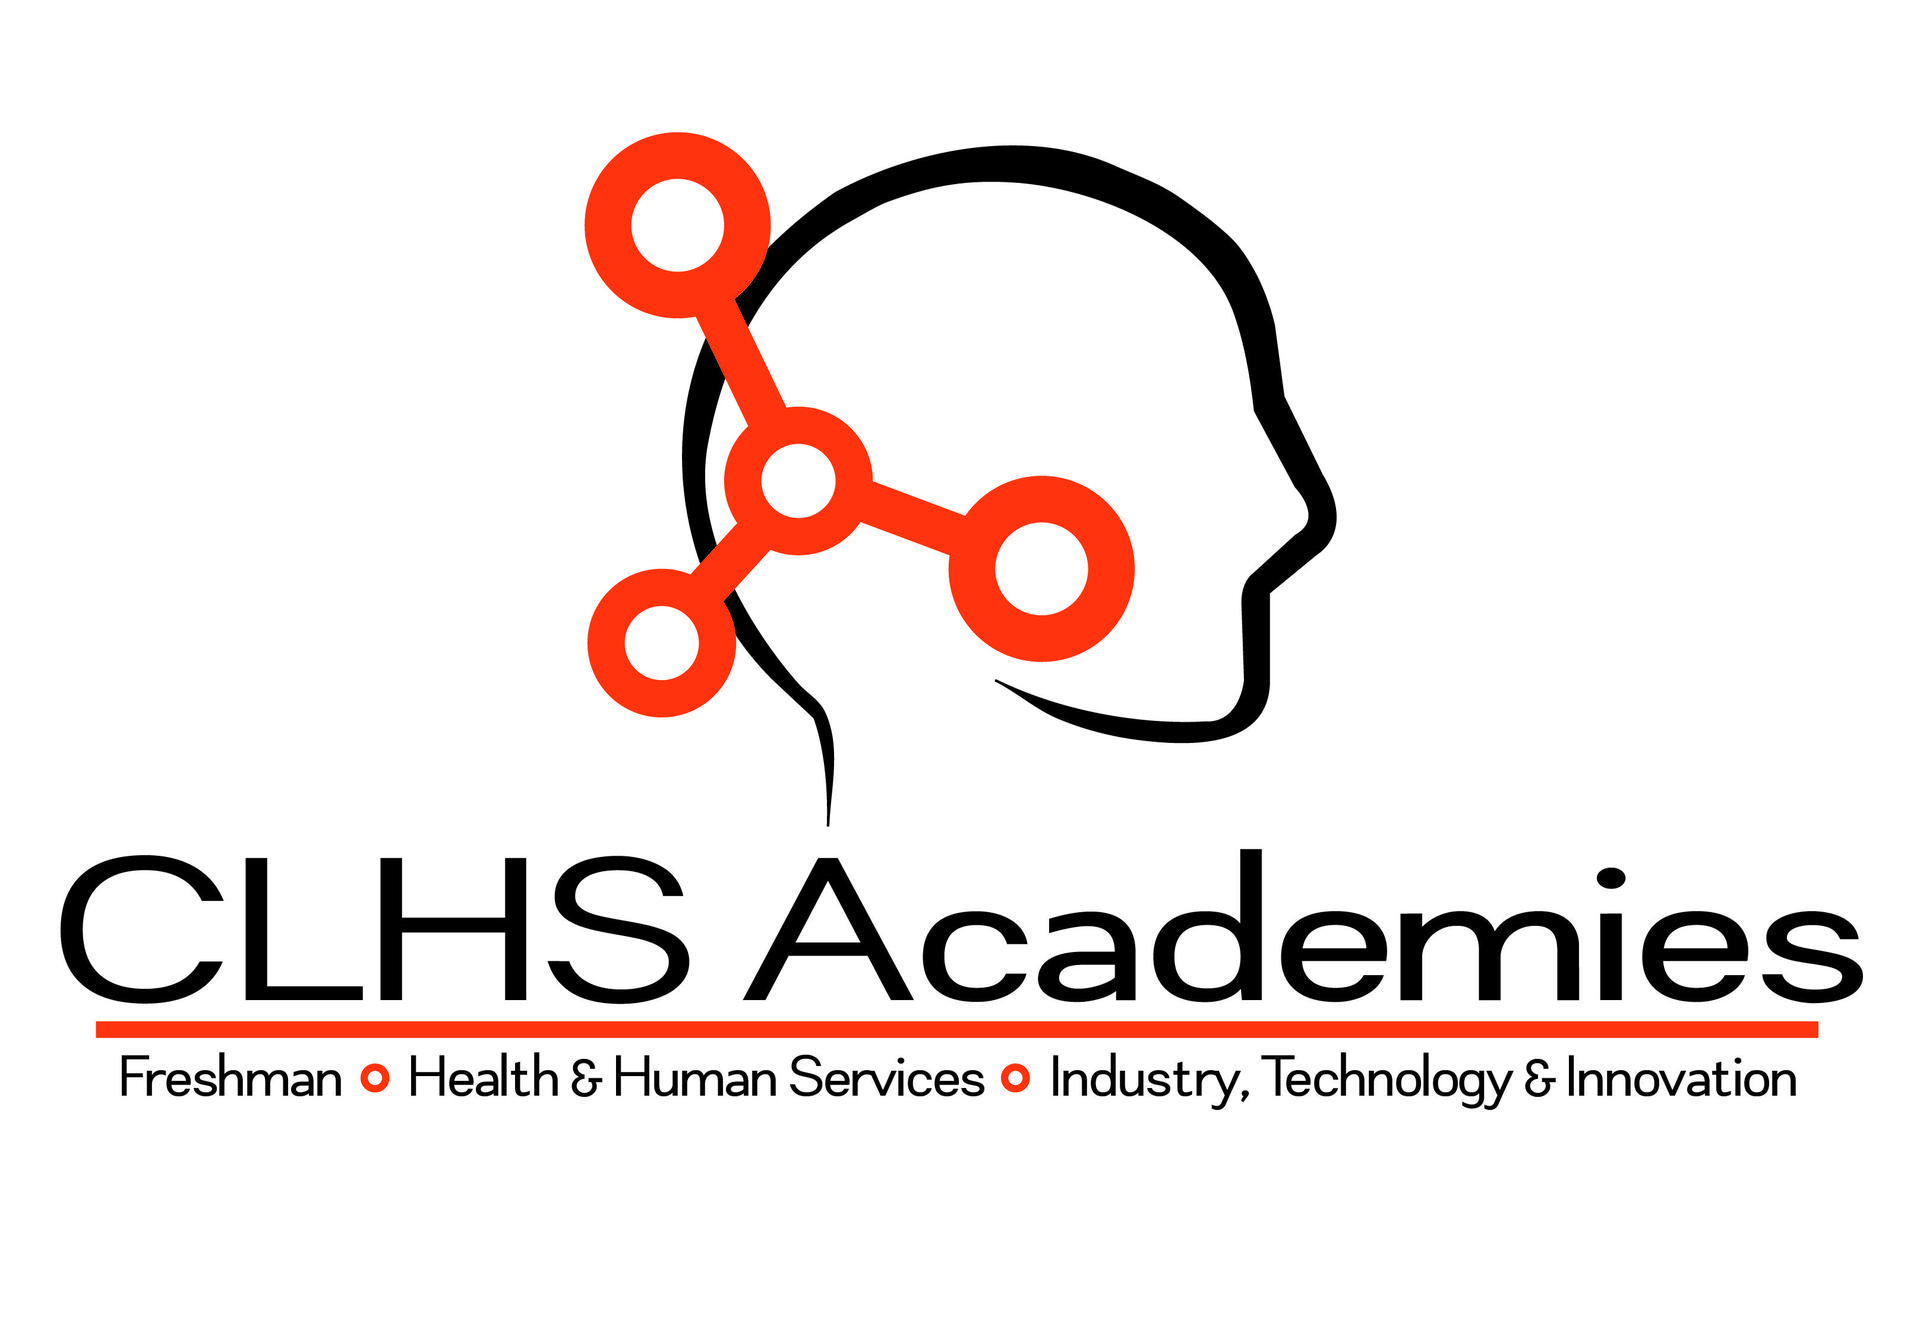 CLHS Academies